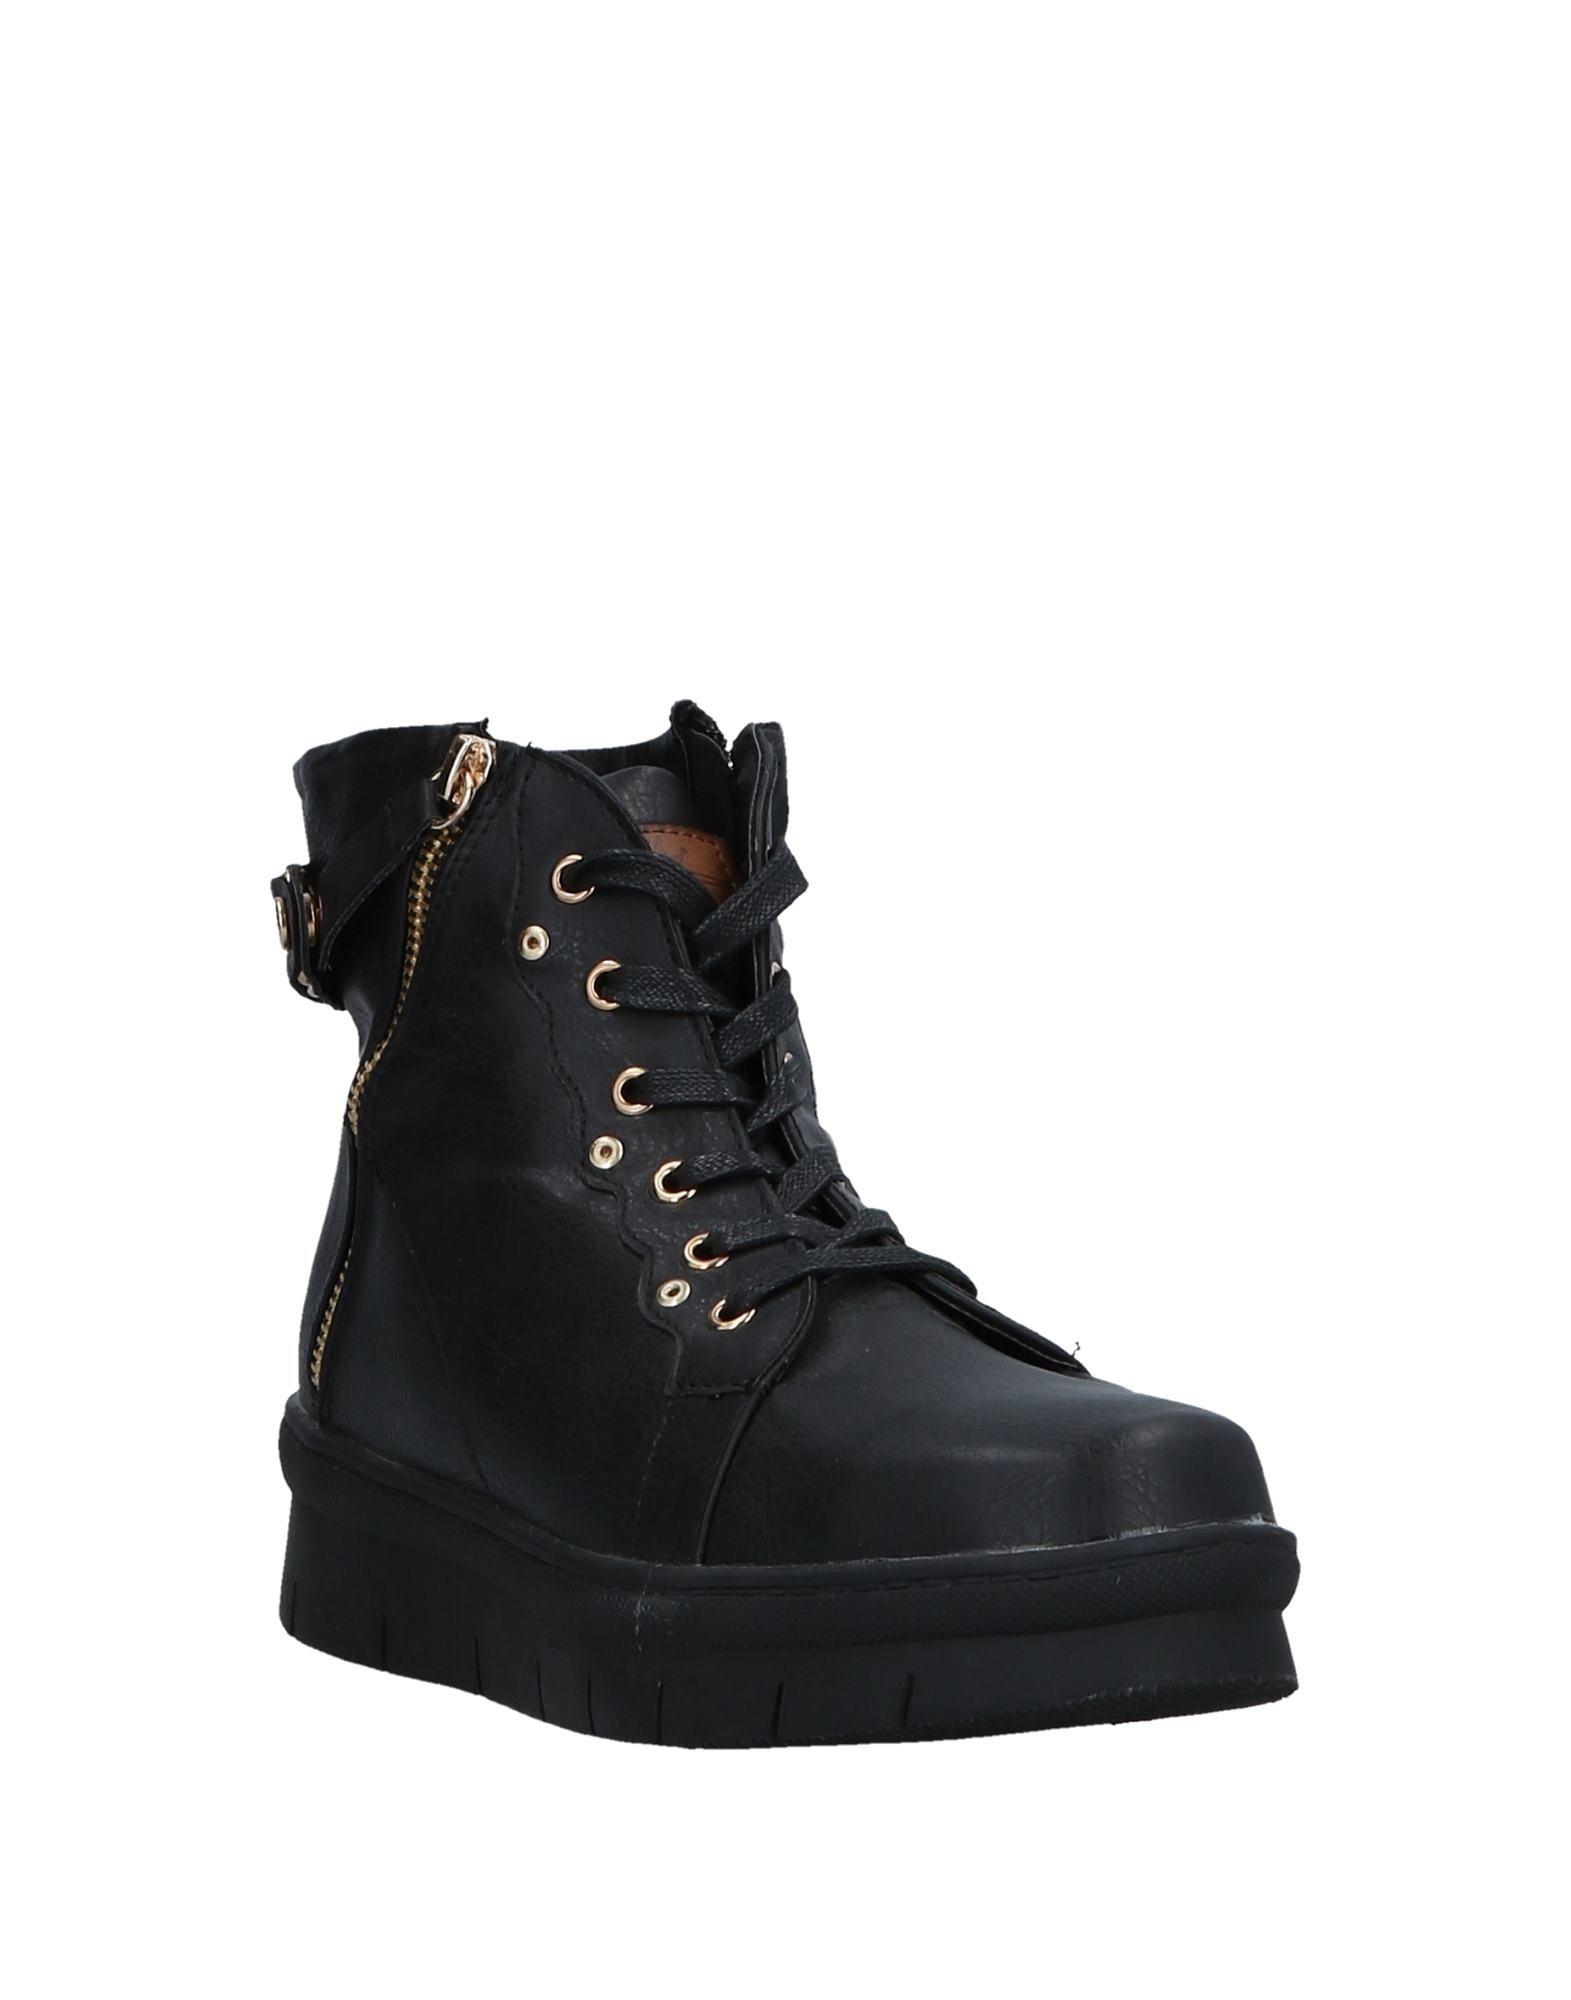 Luna 11259885OK Roja Stiefelette Damen  11259885OK Luna Gute Qualität beliebte Schuhe 91b885